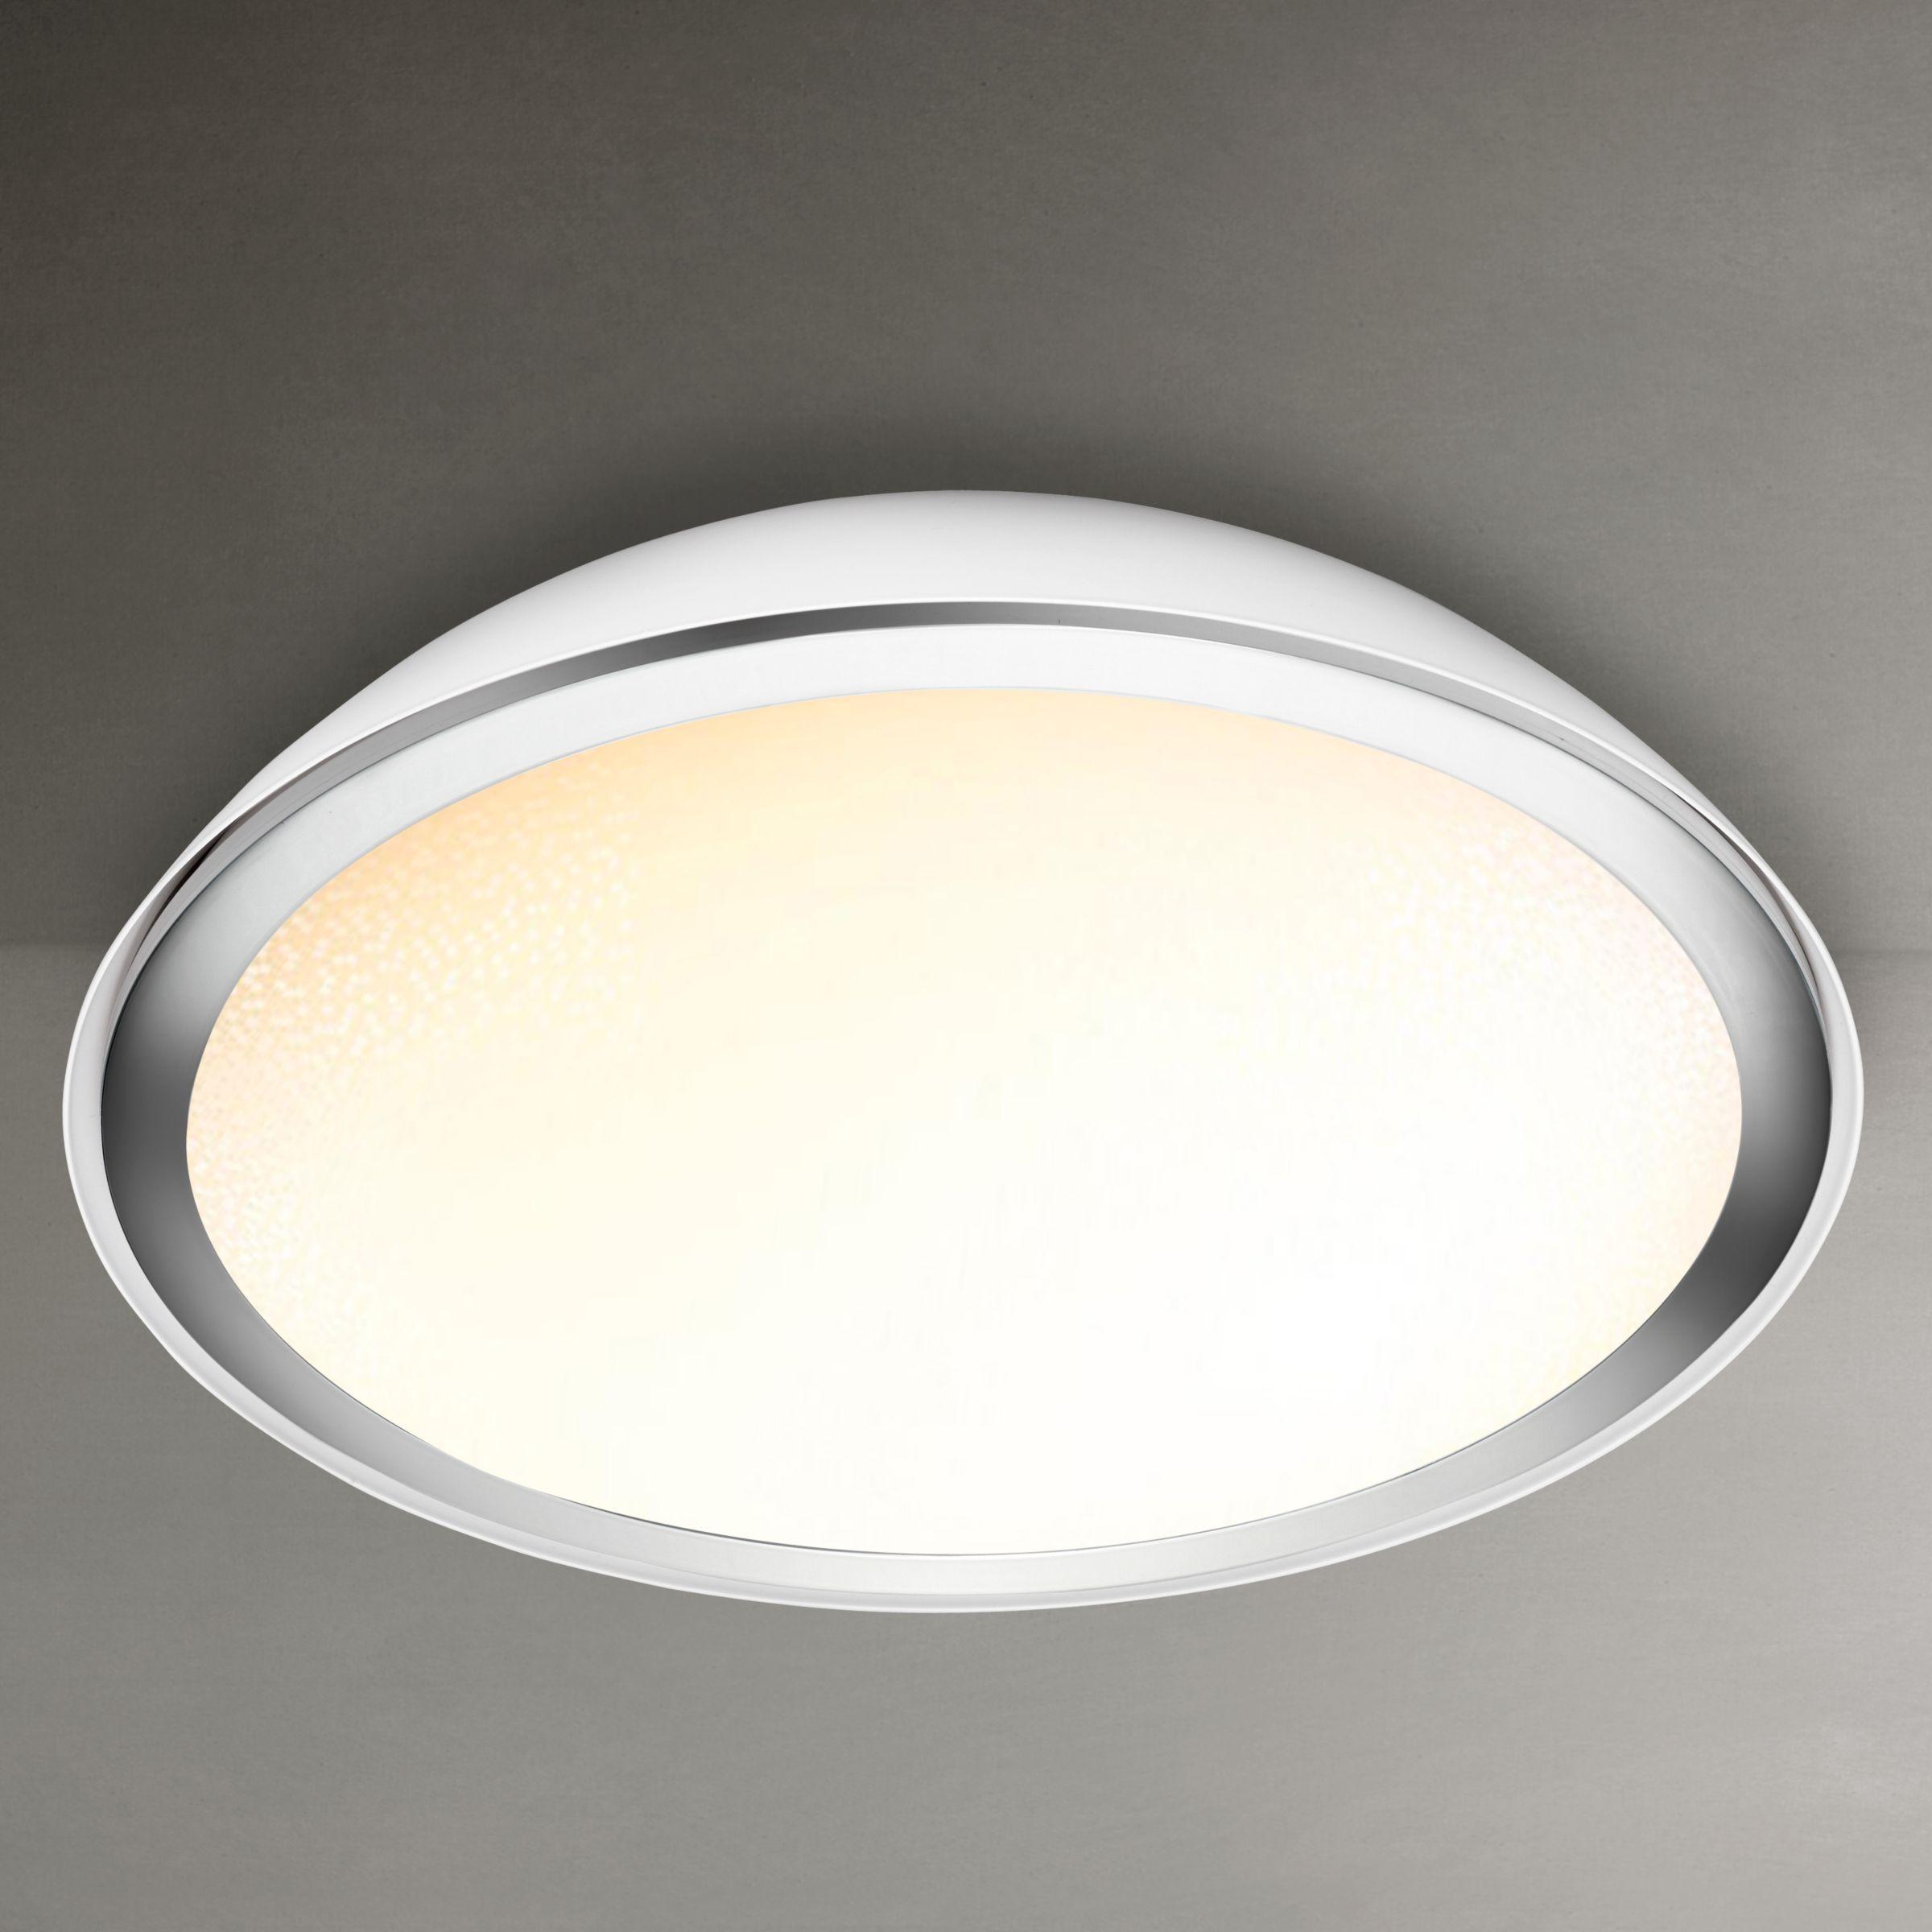 Philips Cool Led Bathroom Light At John Lewis Partners